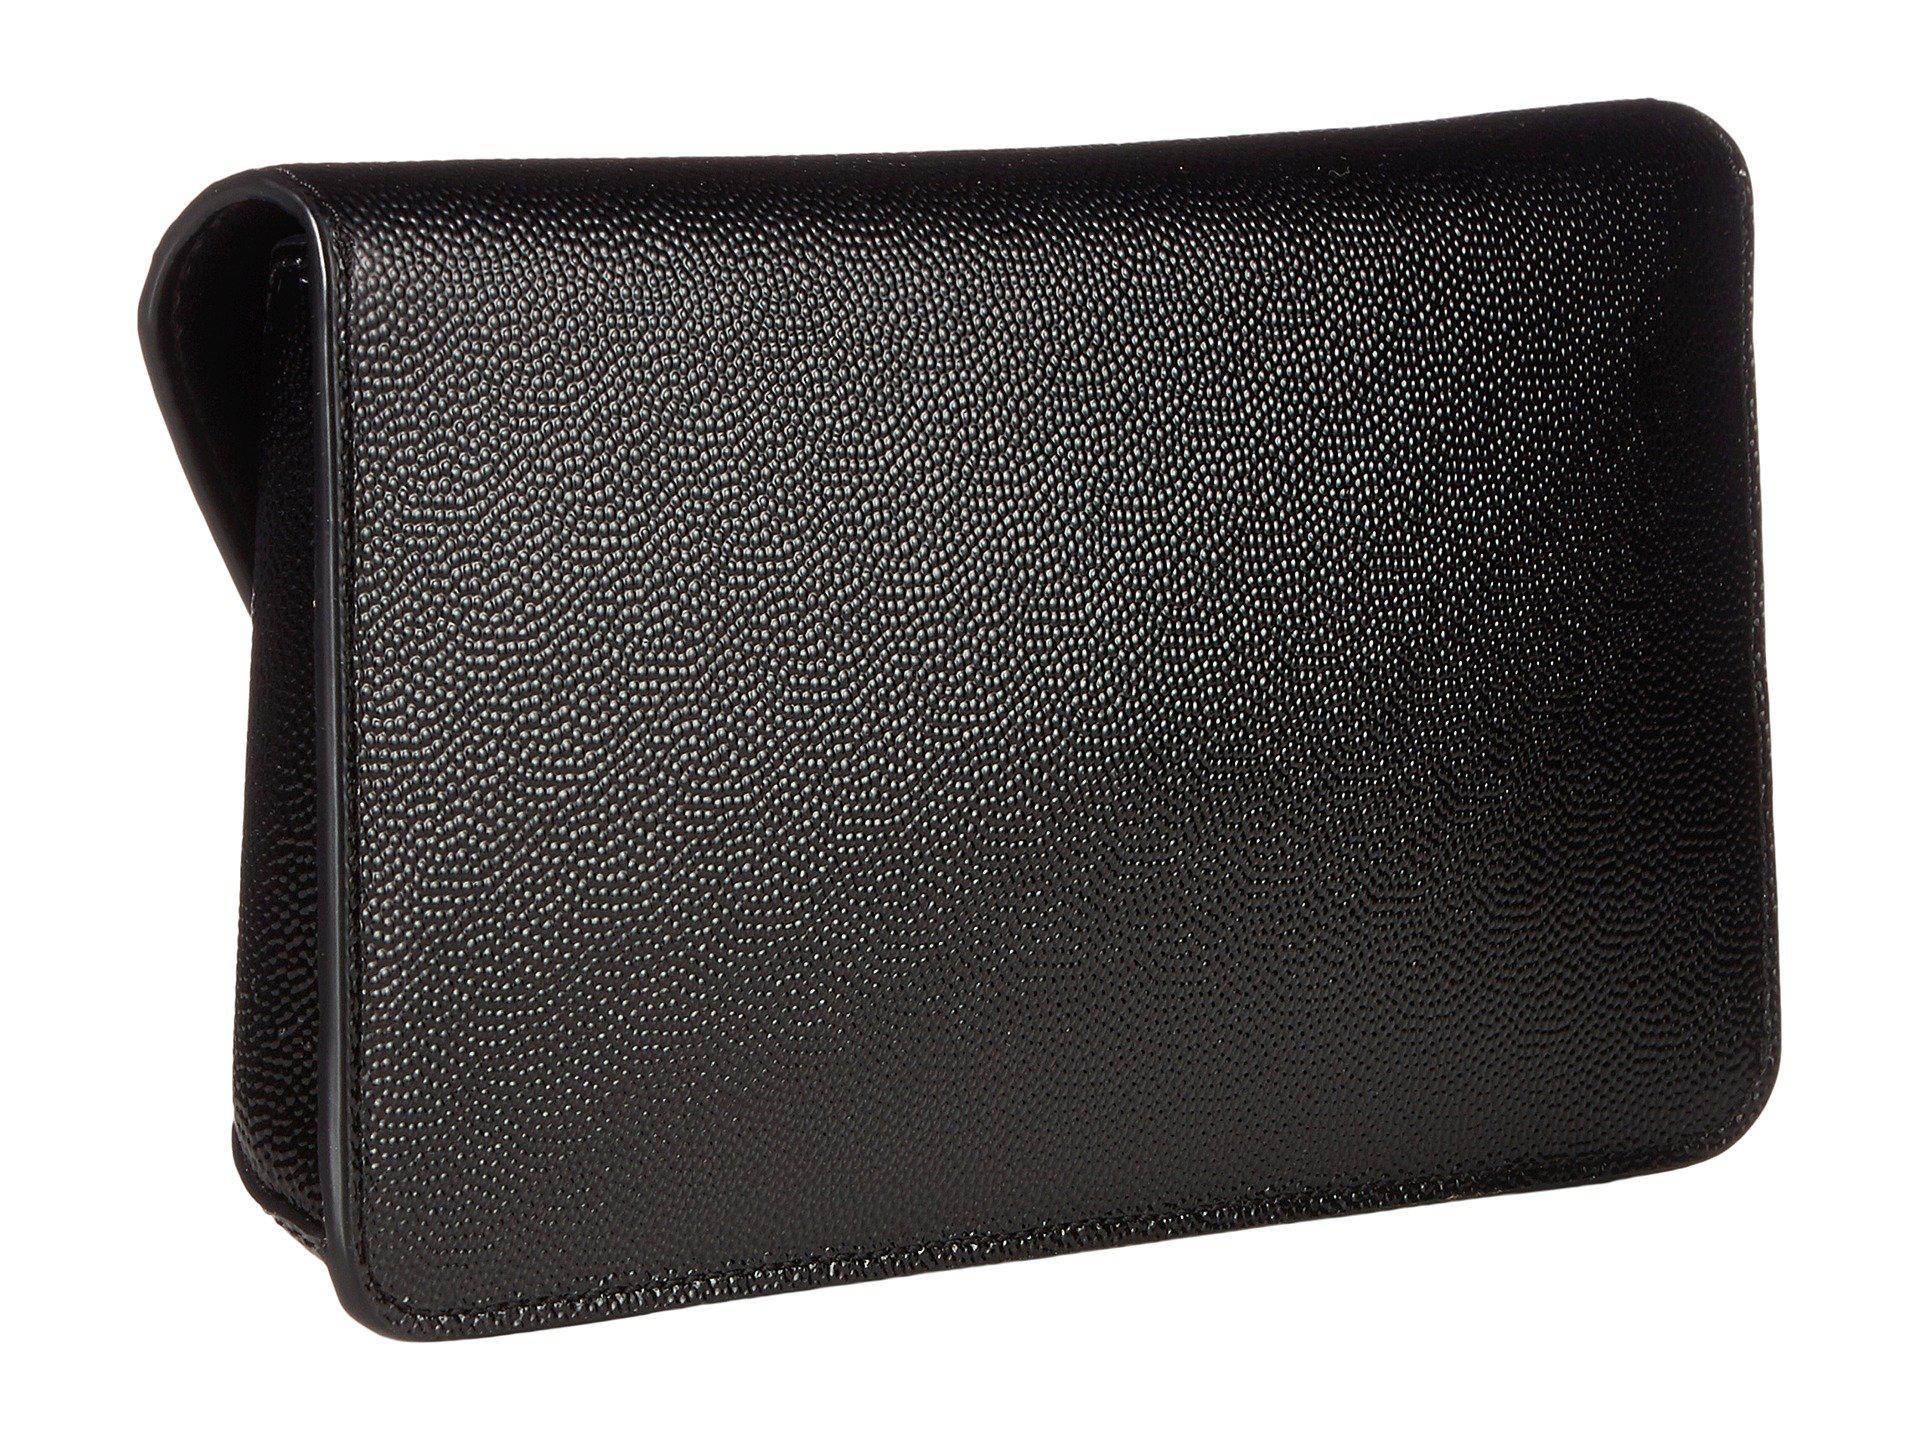 edbee271e99 Tory Burch - Gigi Patent Clutch (black) Clutch Handbags - Lyst. View  fullscreen